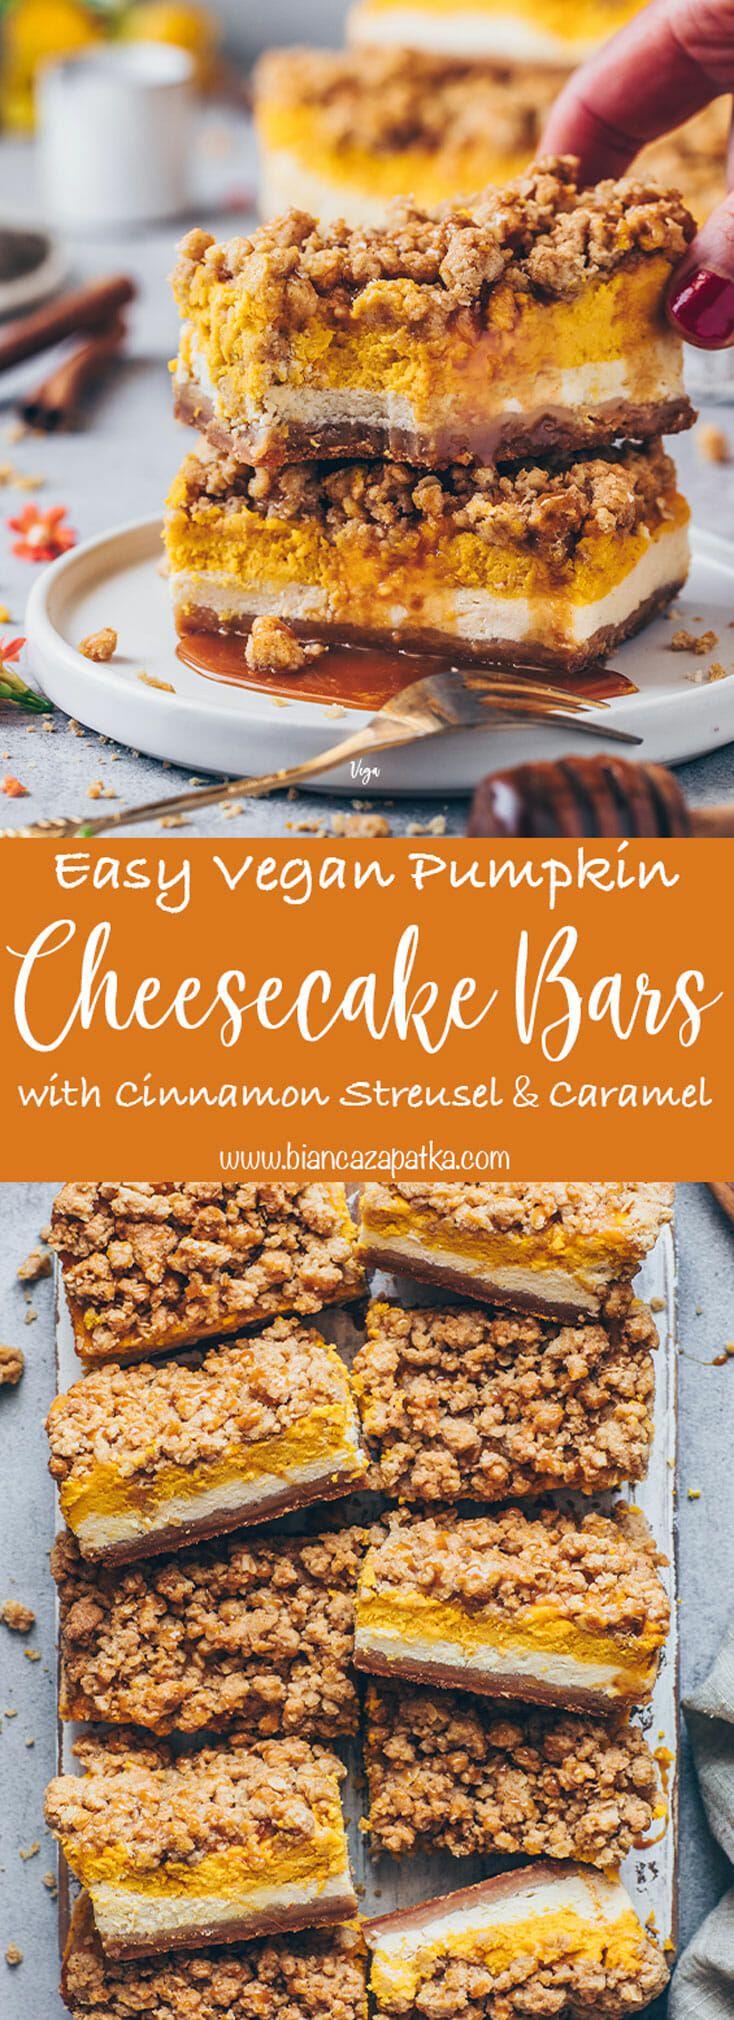 Pumpkin Cheesecake Bars with Cinnamon Streusel | Recipe ...